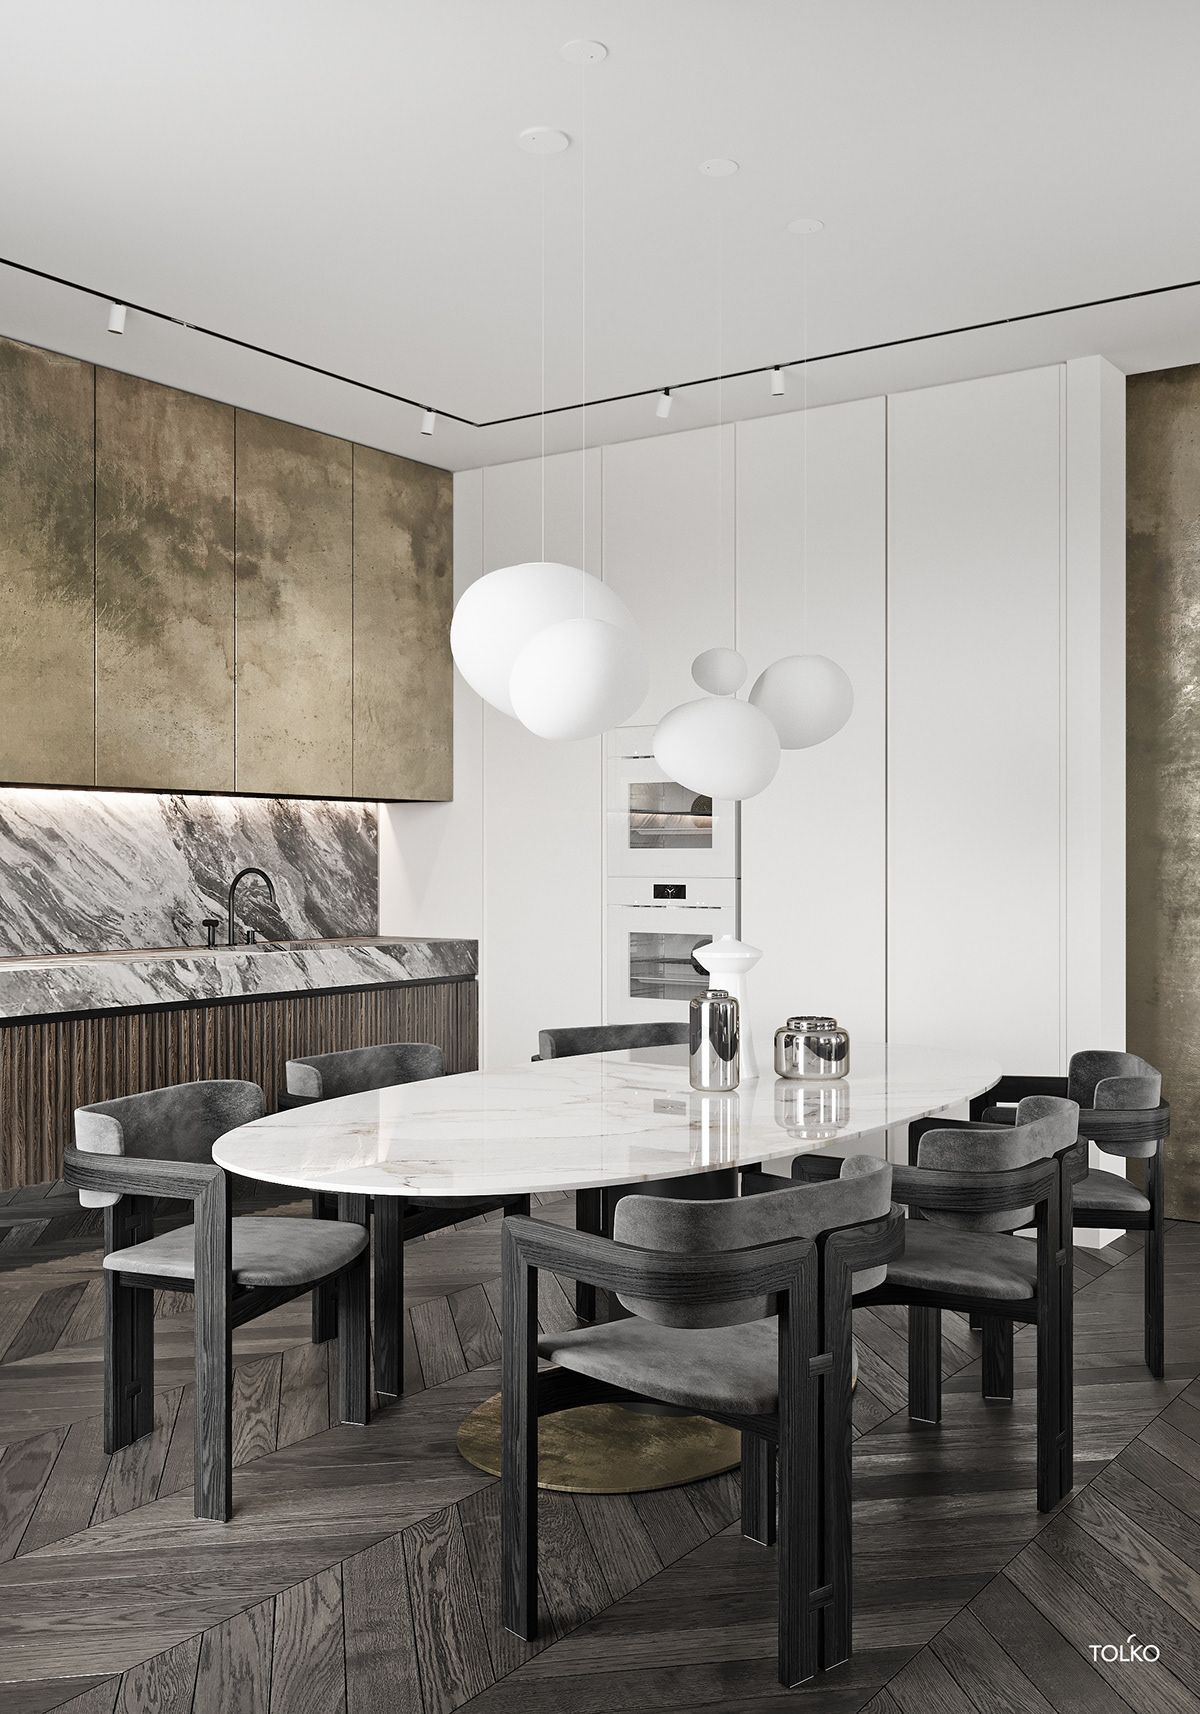 Kitchen Dining Interior Design: Interior Design & Decor (homeadore) Instagram Posts